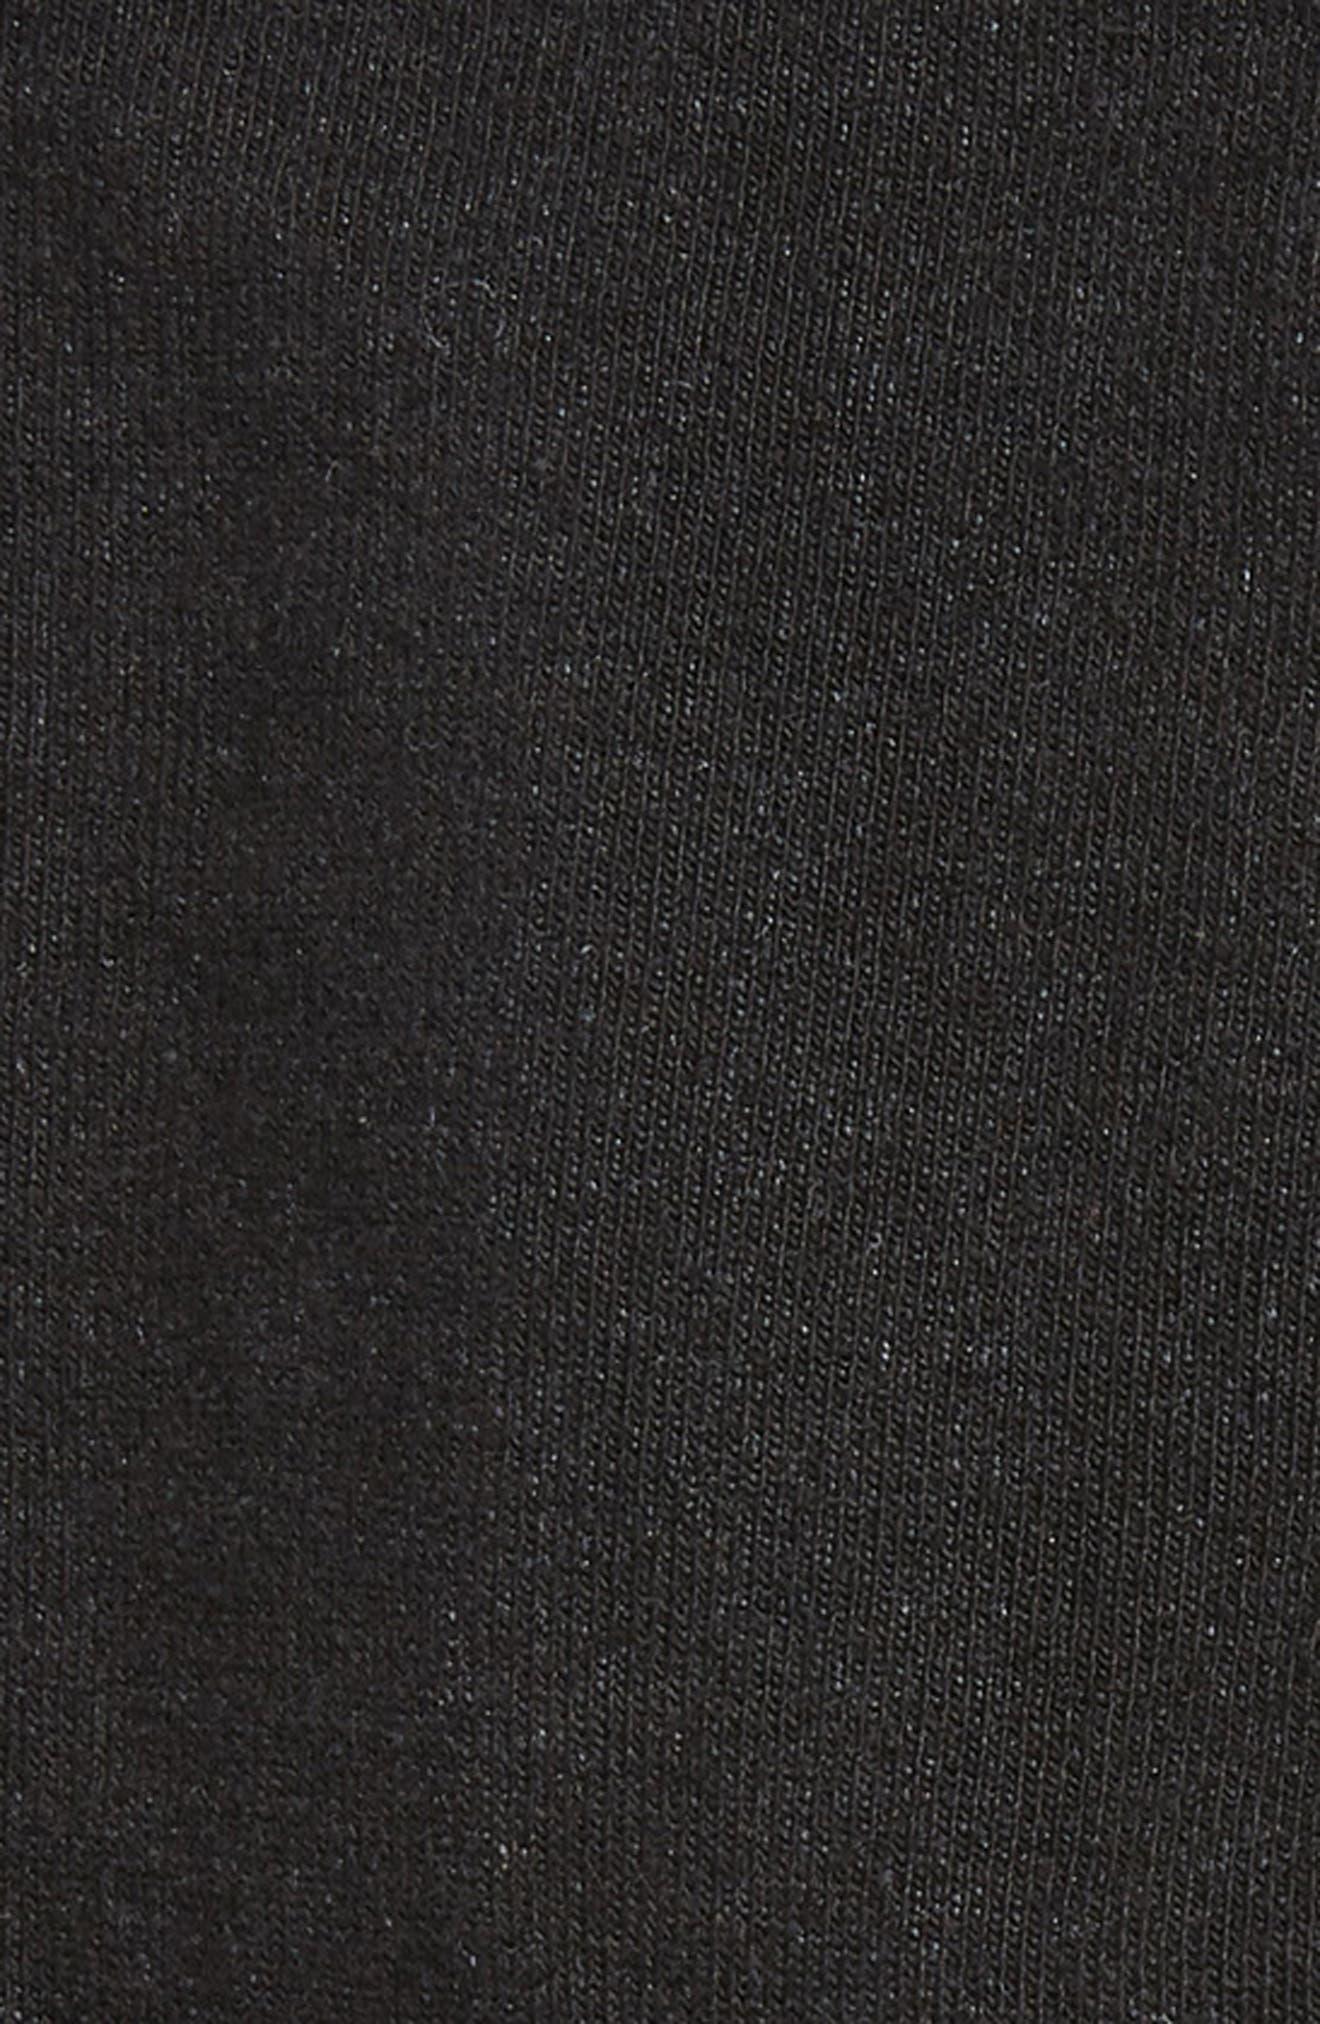 HUE, Jeans 3-Pack Crew Socks, Alternate thumbnail 2, color, BLACK